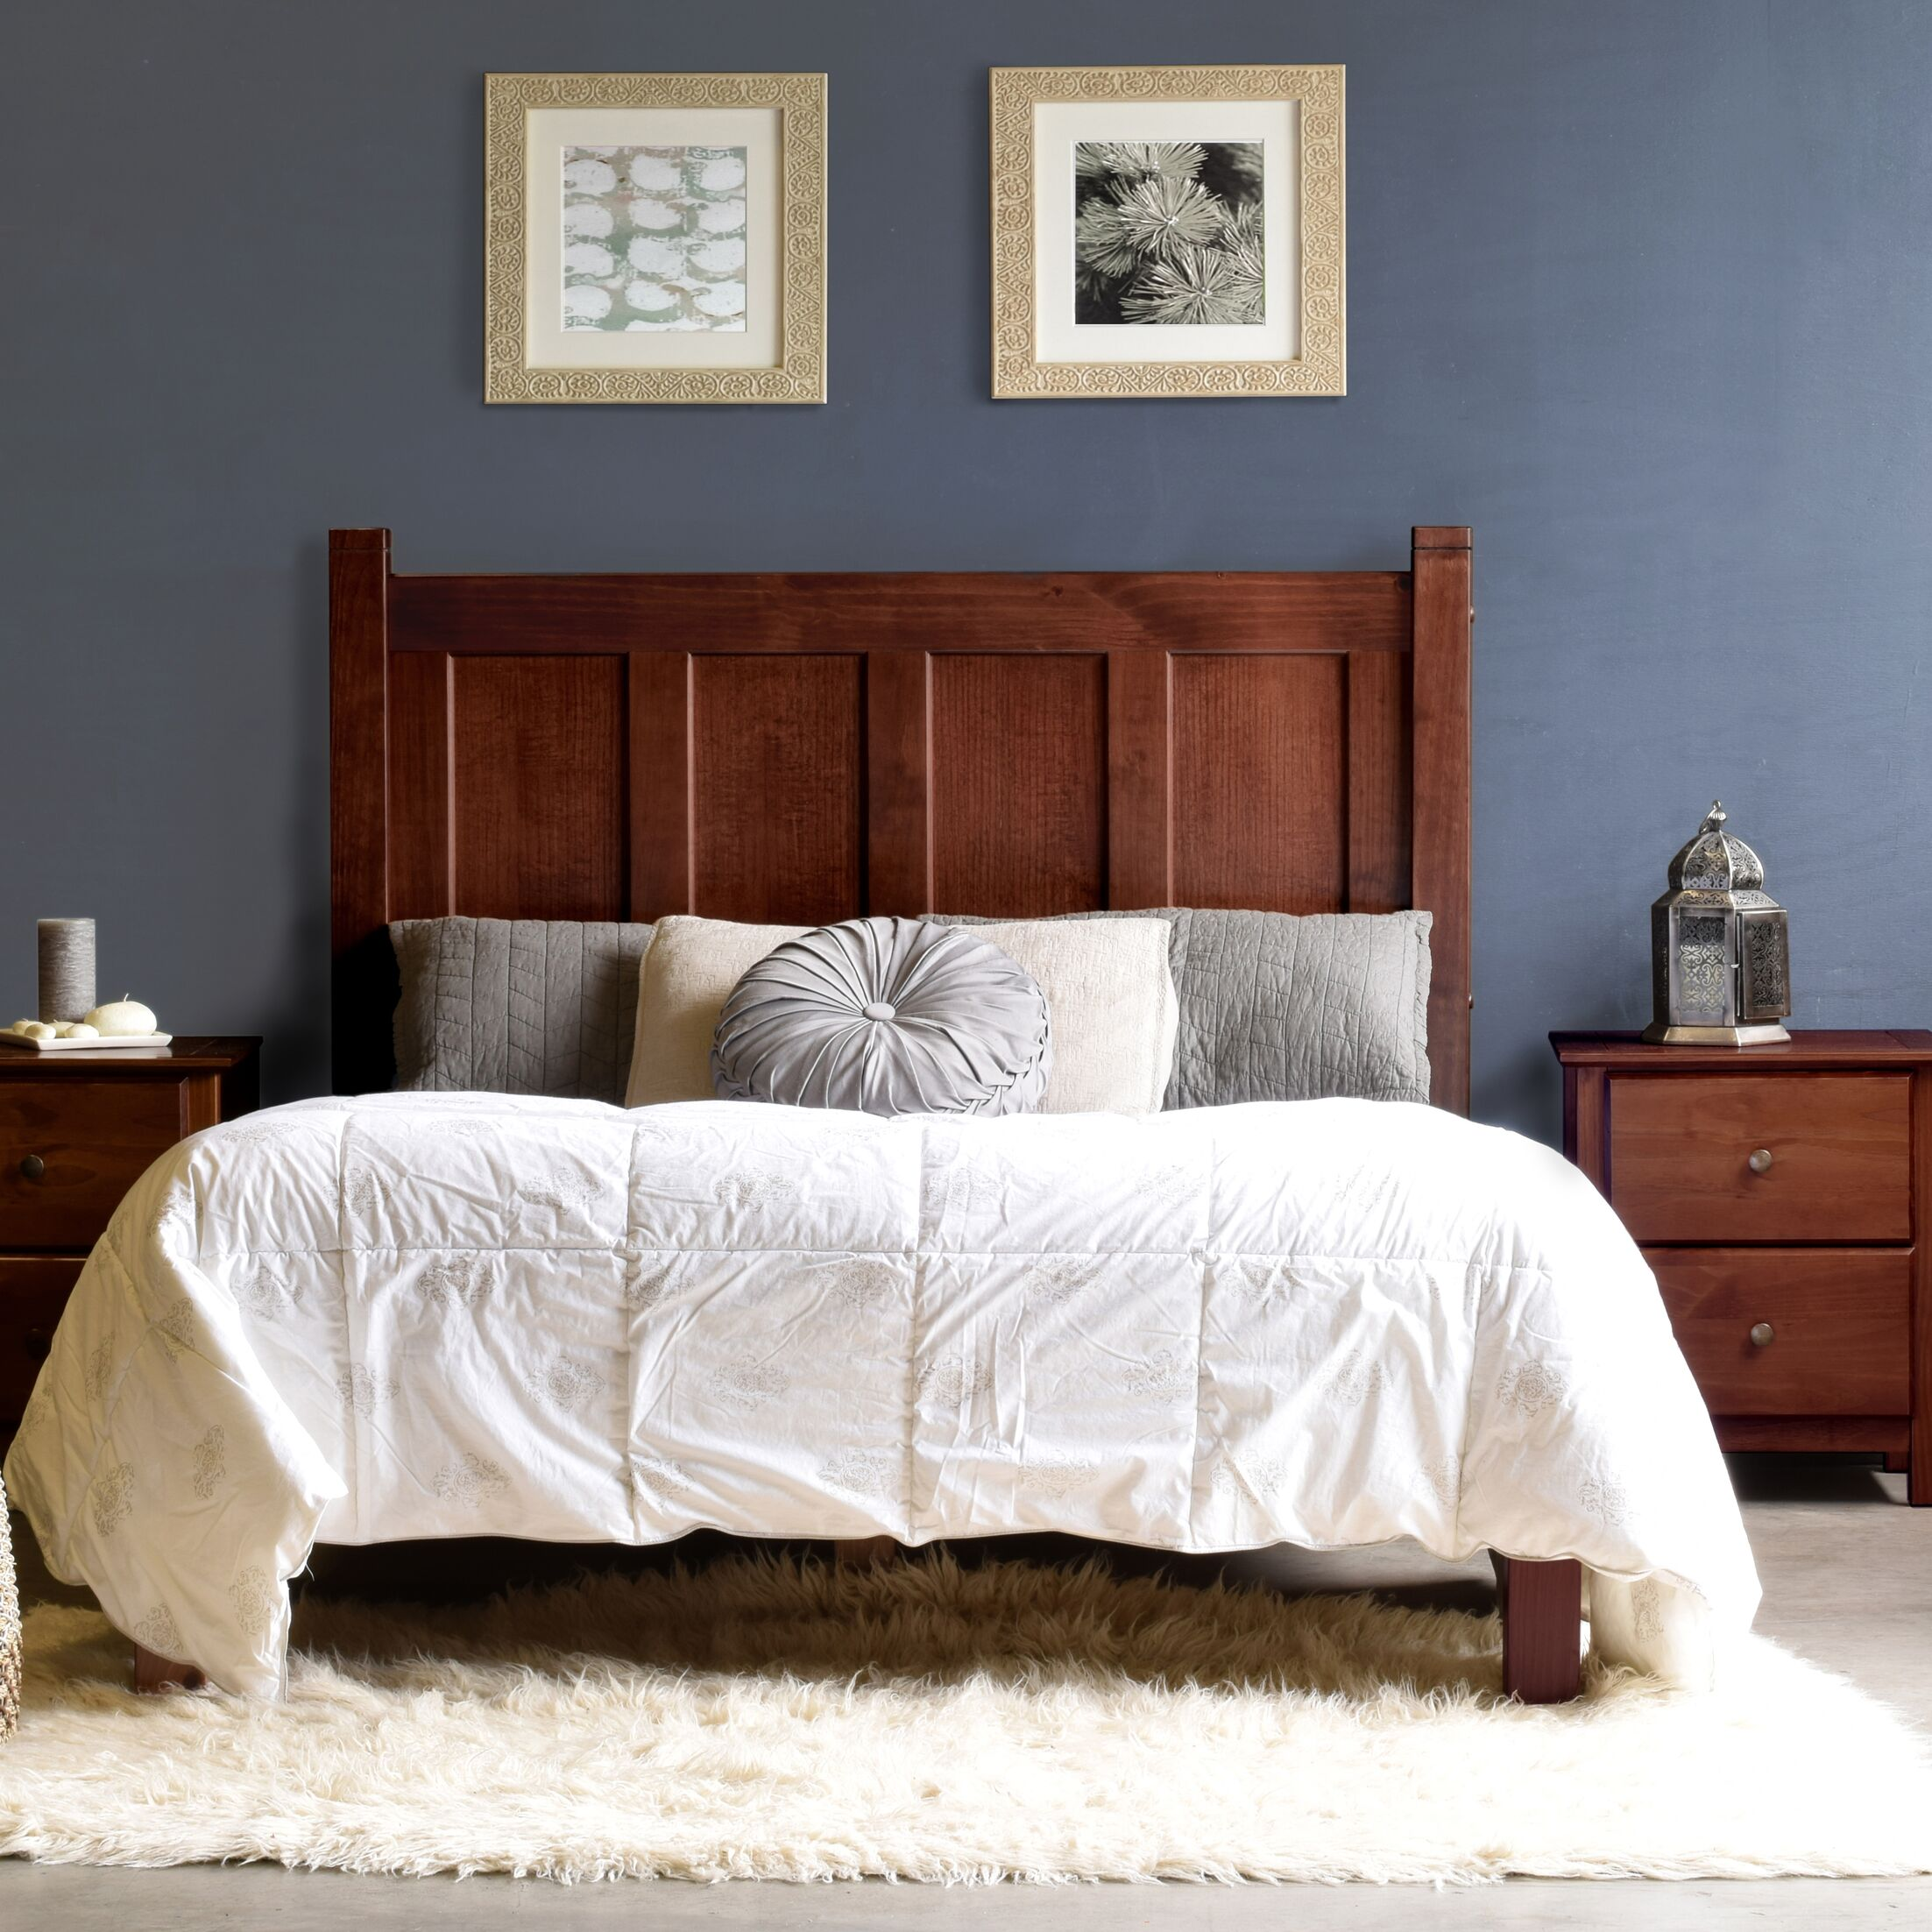 Shaker Platform Bed Color: Cherry, Size: Queen